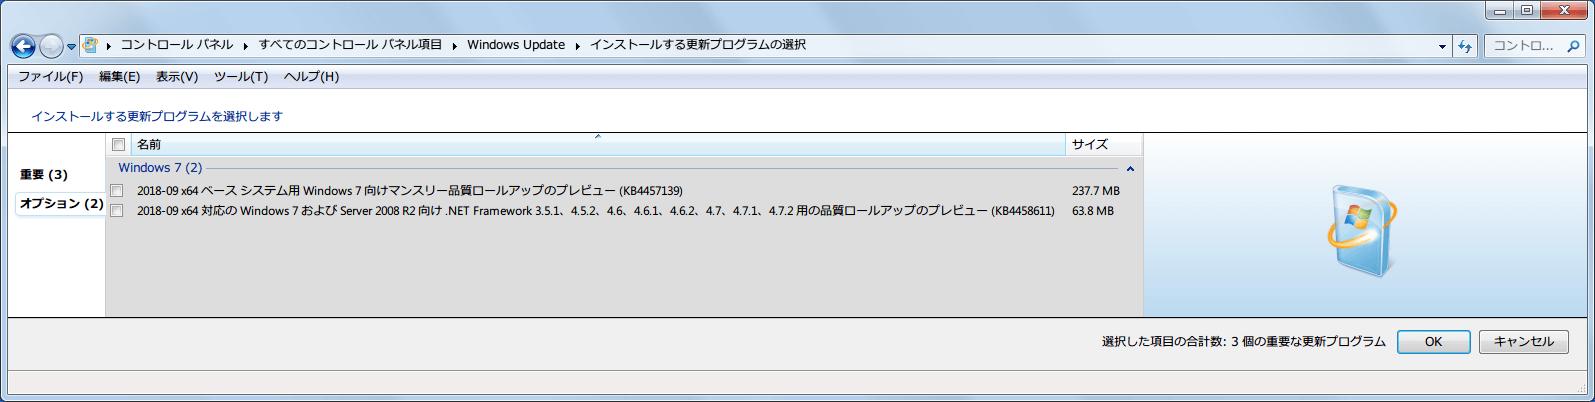 Windows 7 64bit Windows Update オプション 2018年9月分リスト